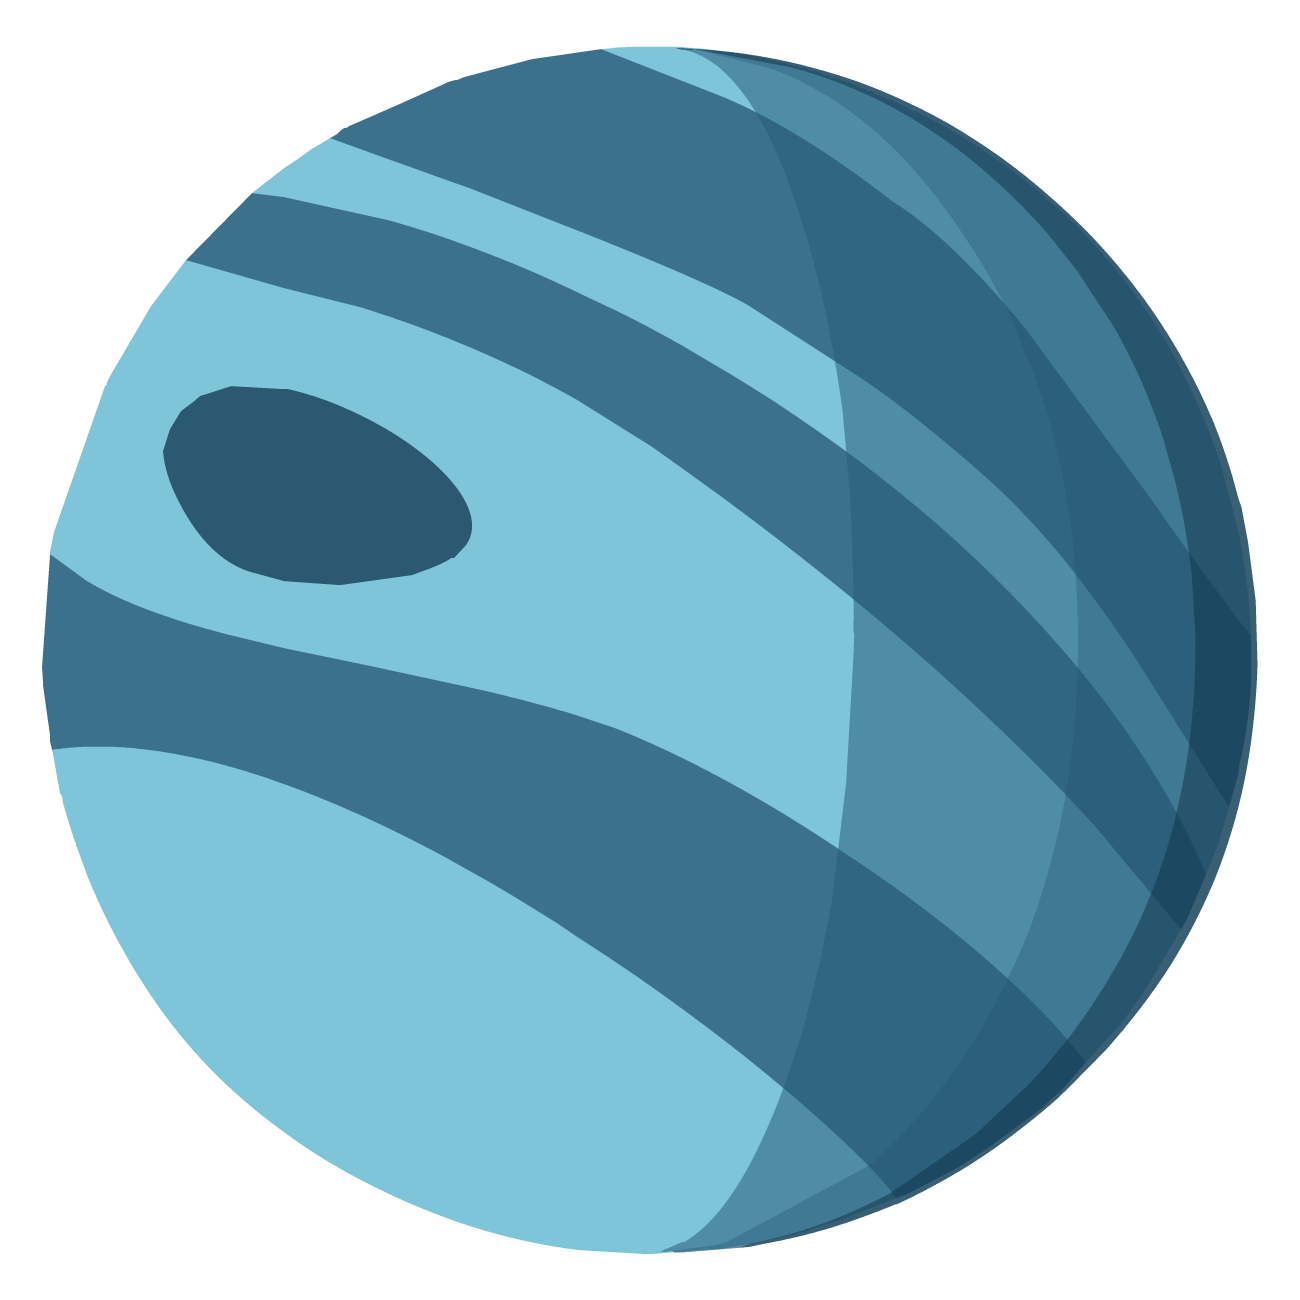 Planet clipart cartoon. Neptune google search eci